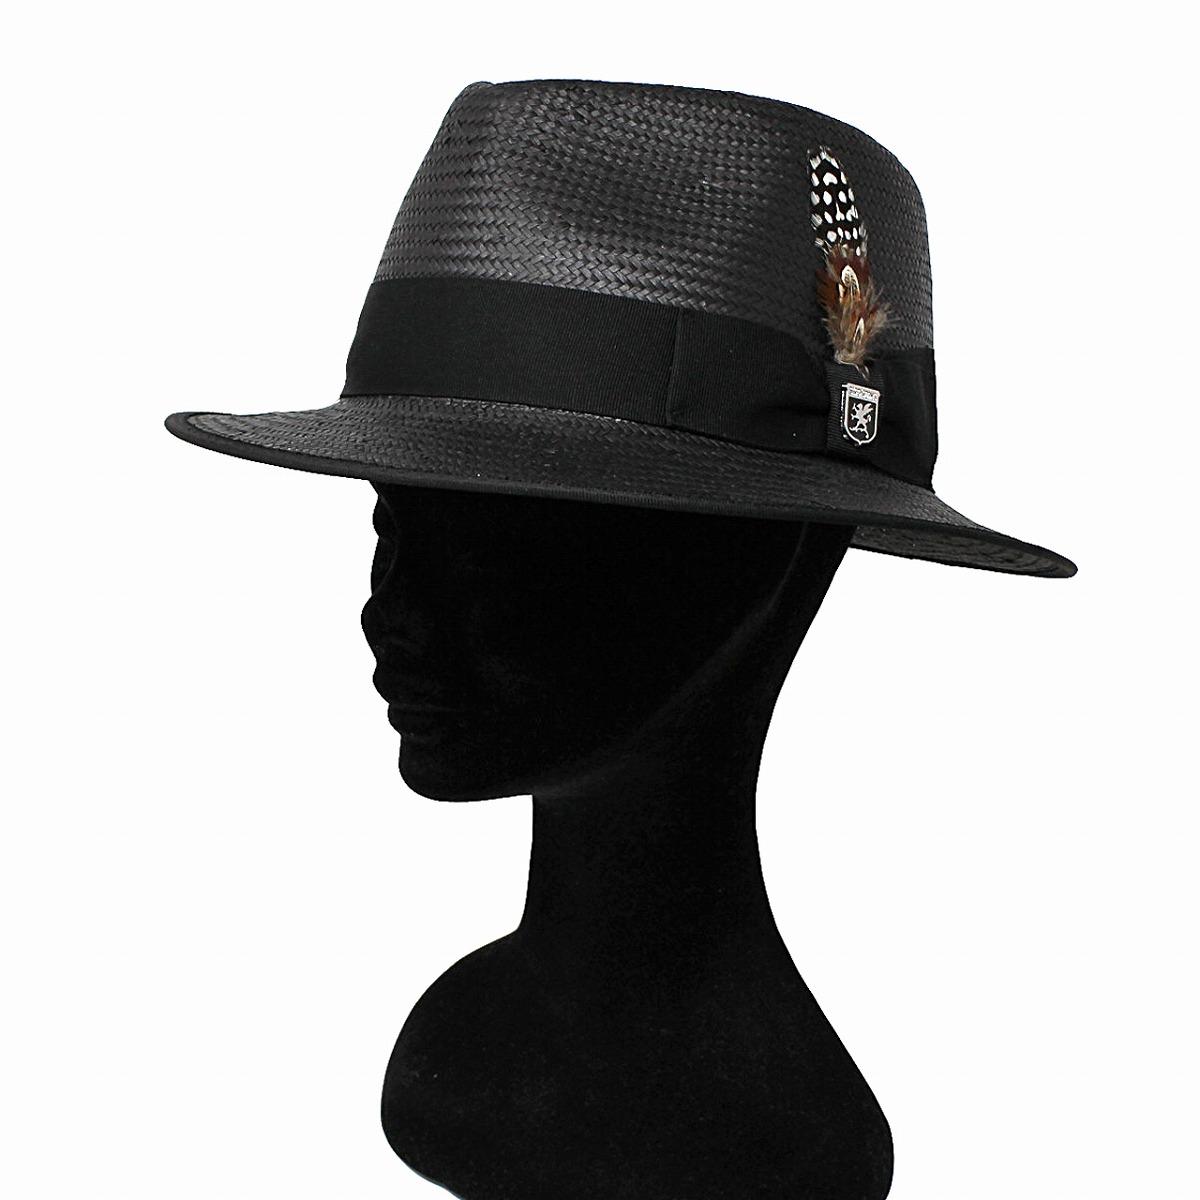 ... Gentleman Austin broad-brimmed hat TOYO import straw hat M L XL fashion  resort coordinates awning cfeee52ebde